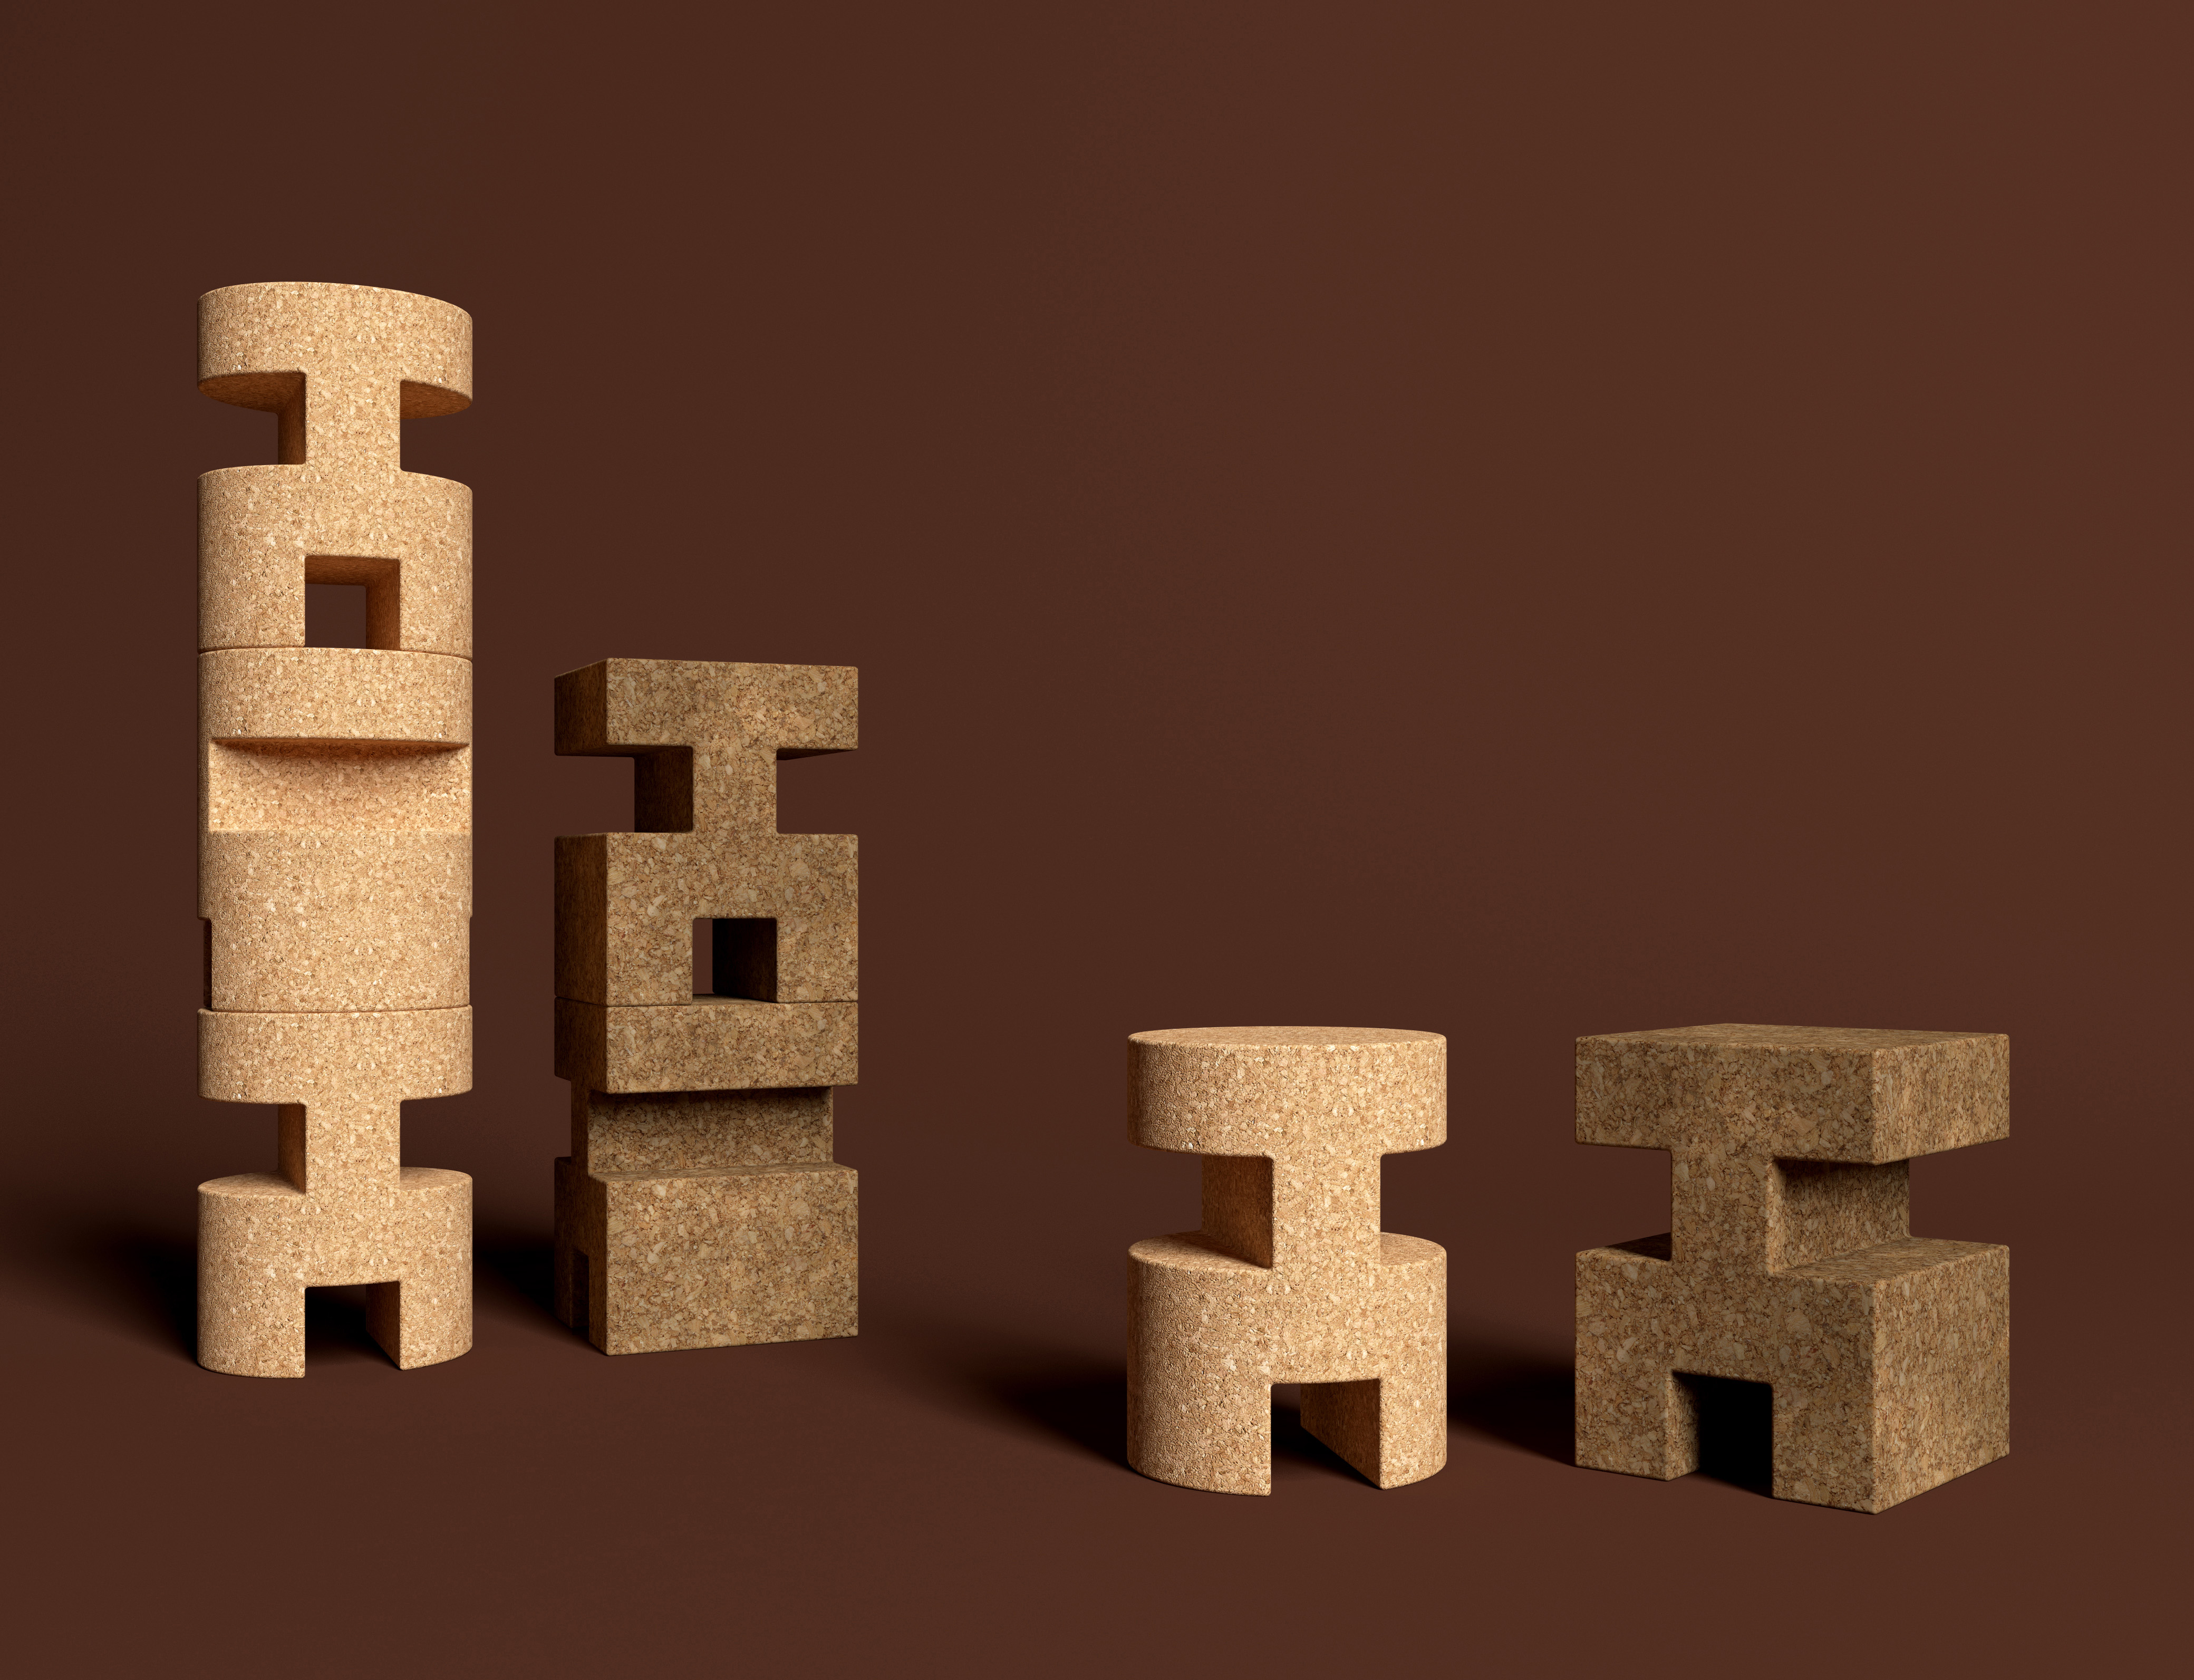 CUBY CYLO cork by Gerard de Hoop